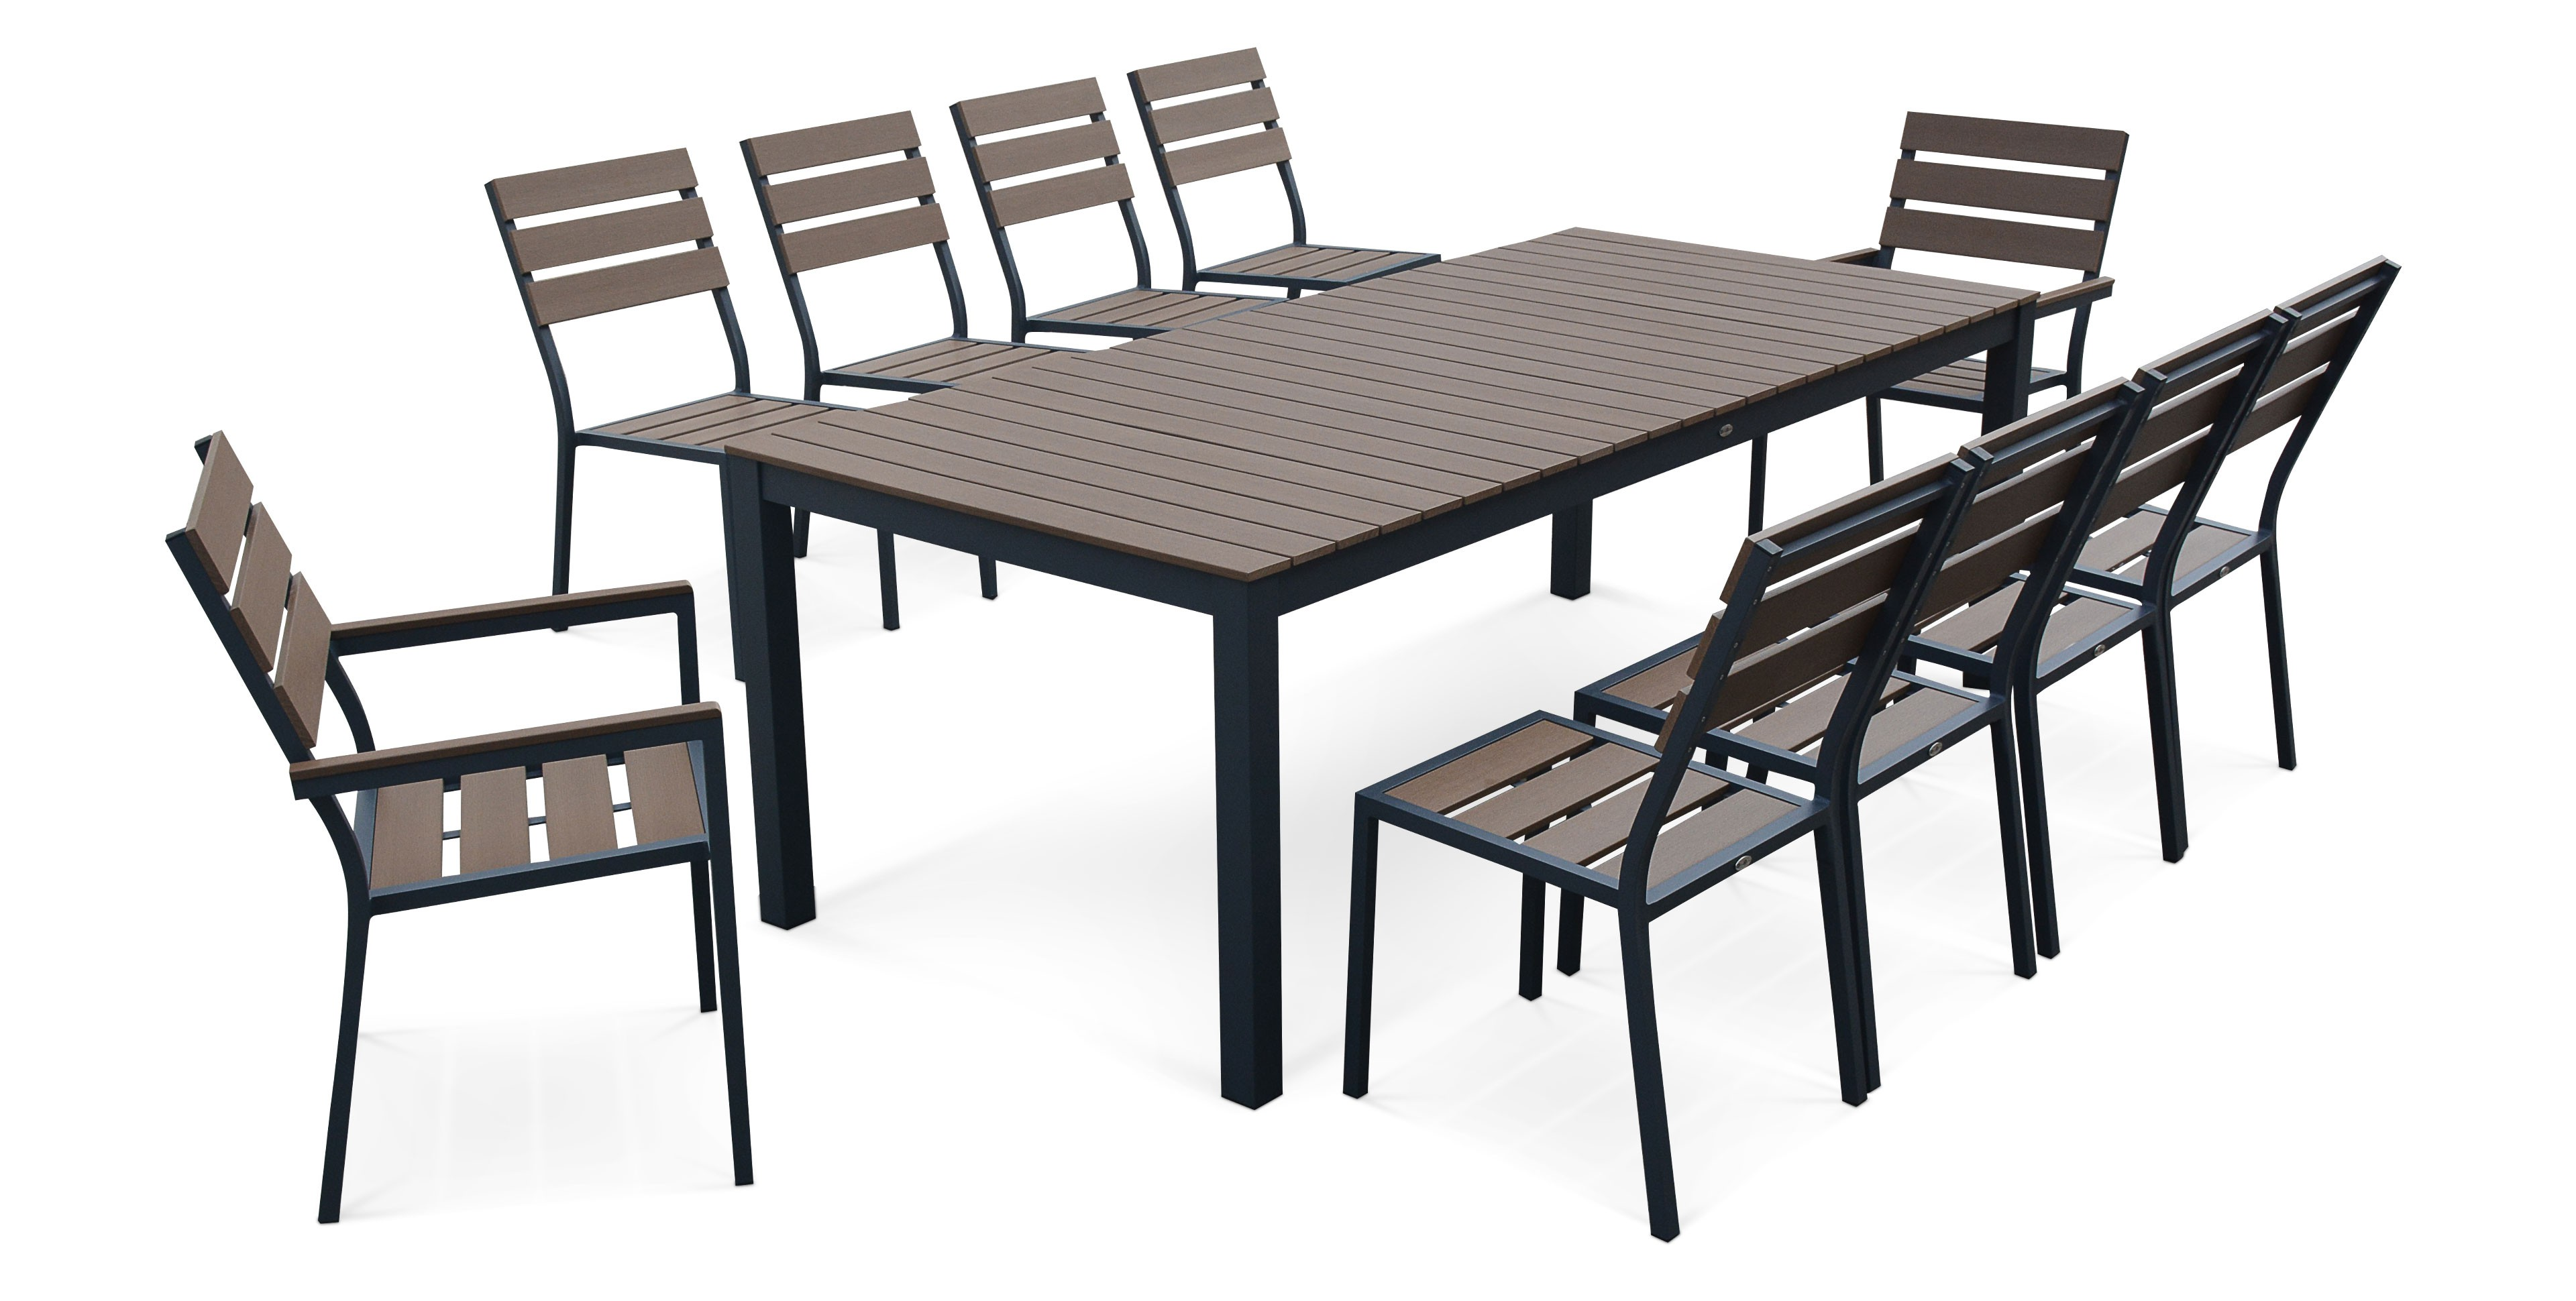 Table et chaises de salon de jardin - Mailleraye.fr jardin